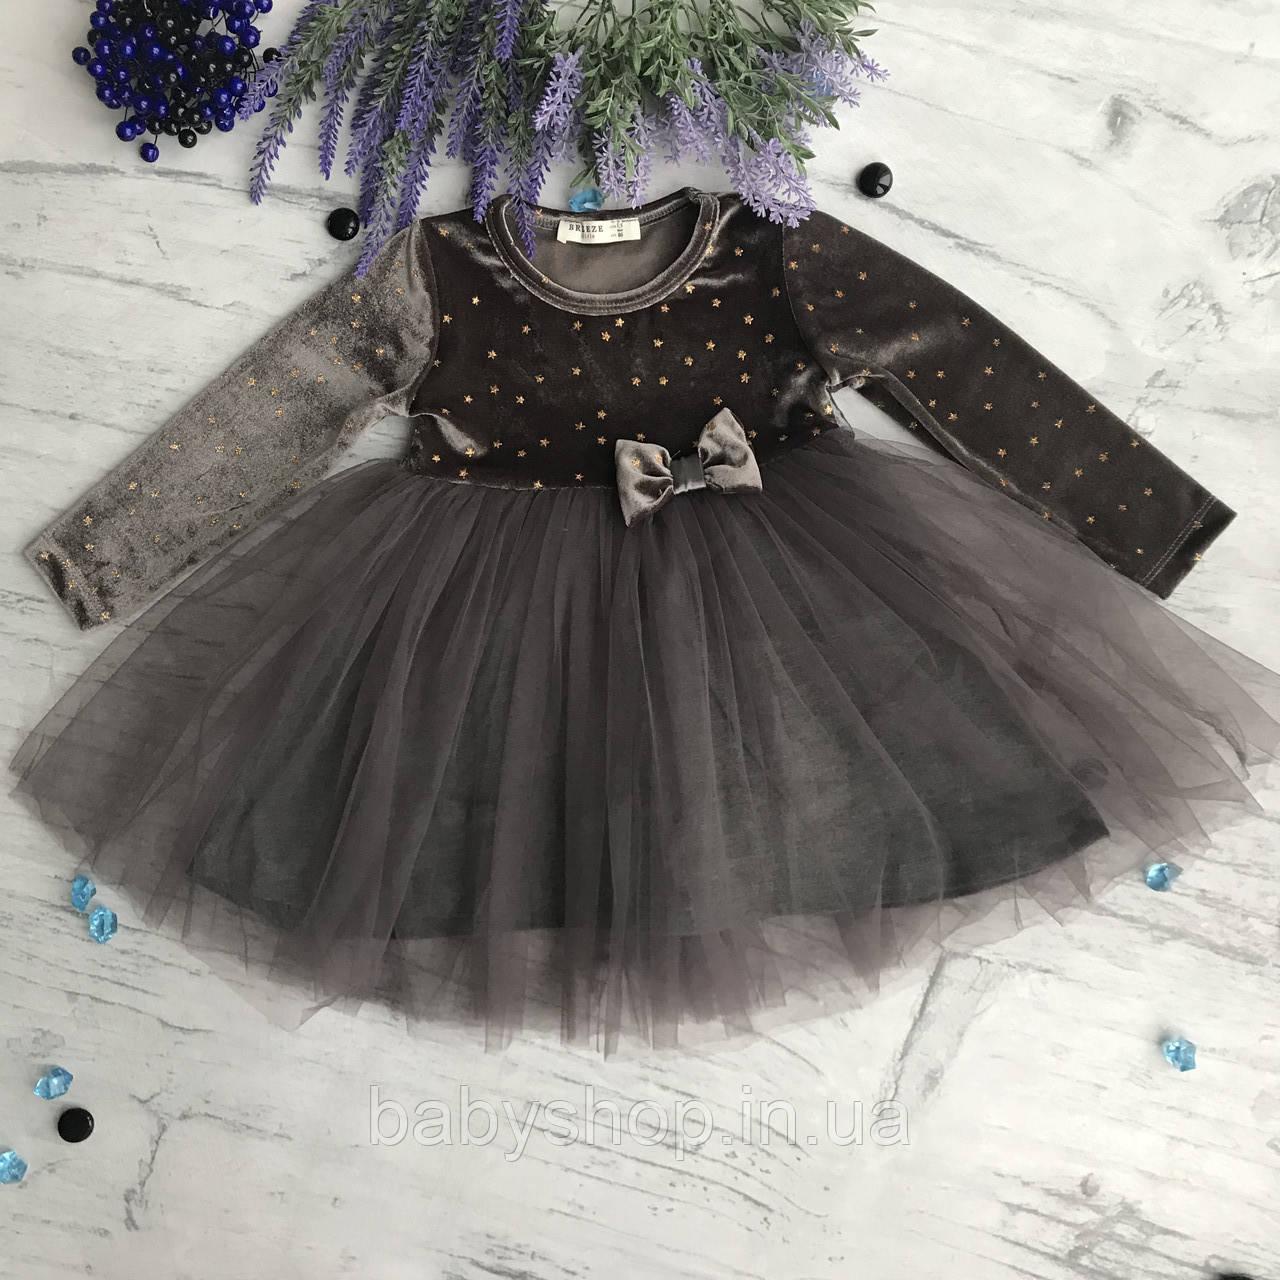 Платье на у девочку Breeze 22. Размер  92 см, 98 см